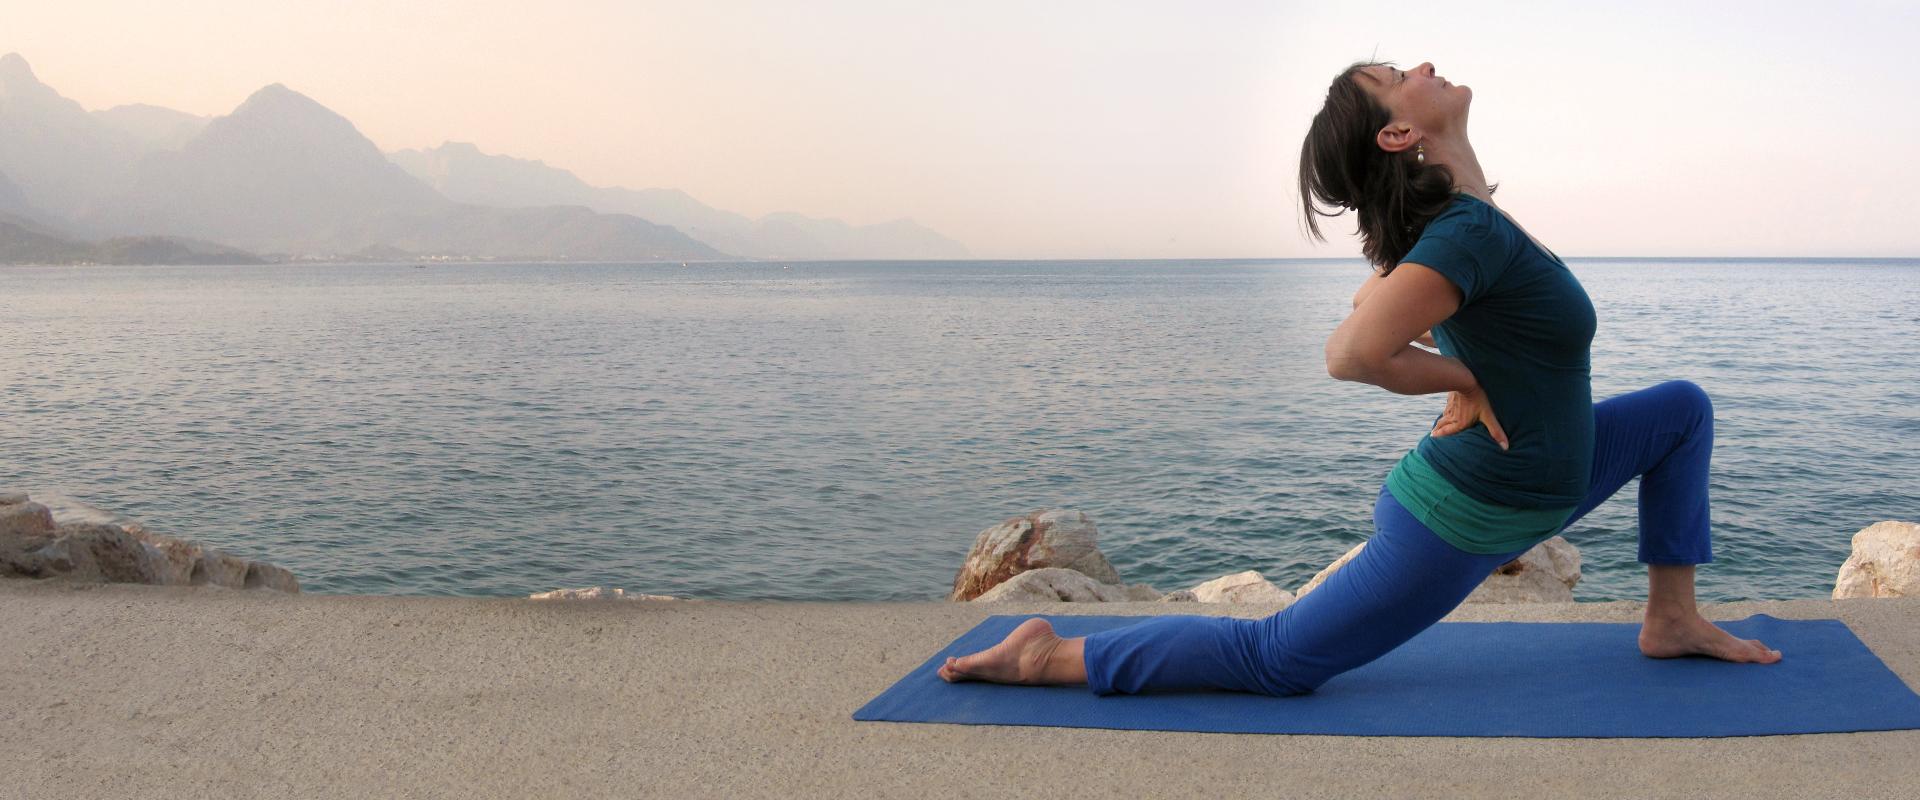 yogashakti_slider_home_01